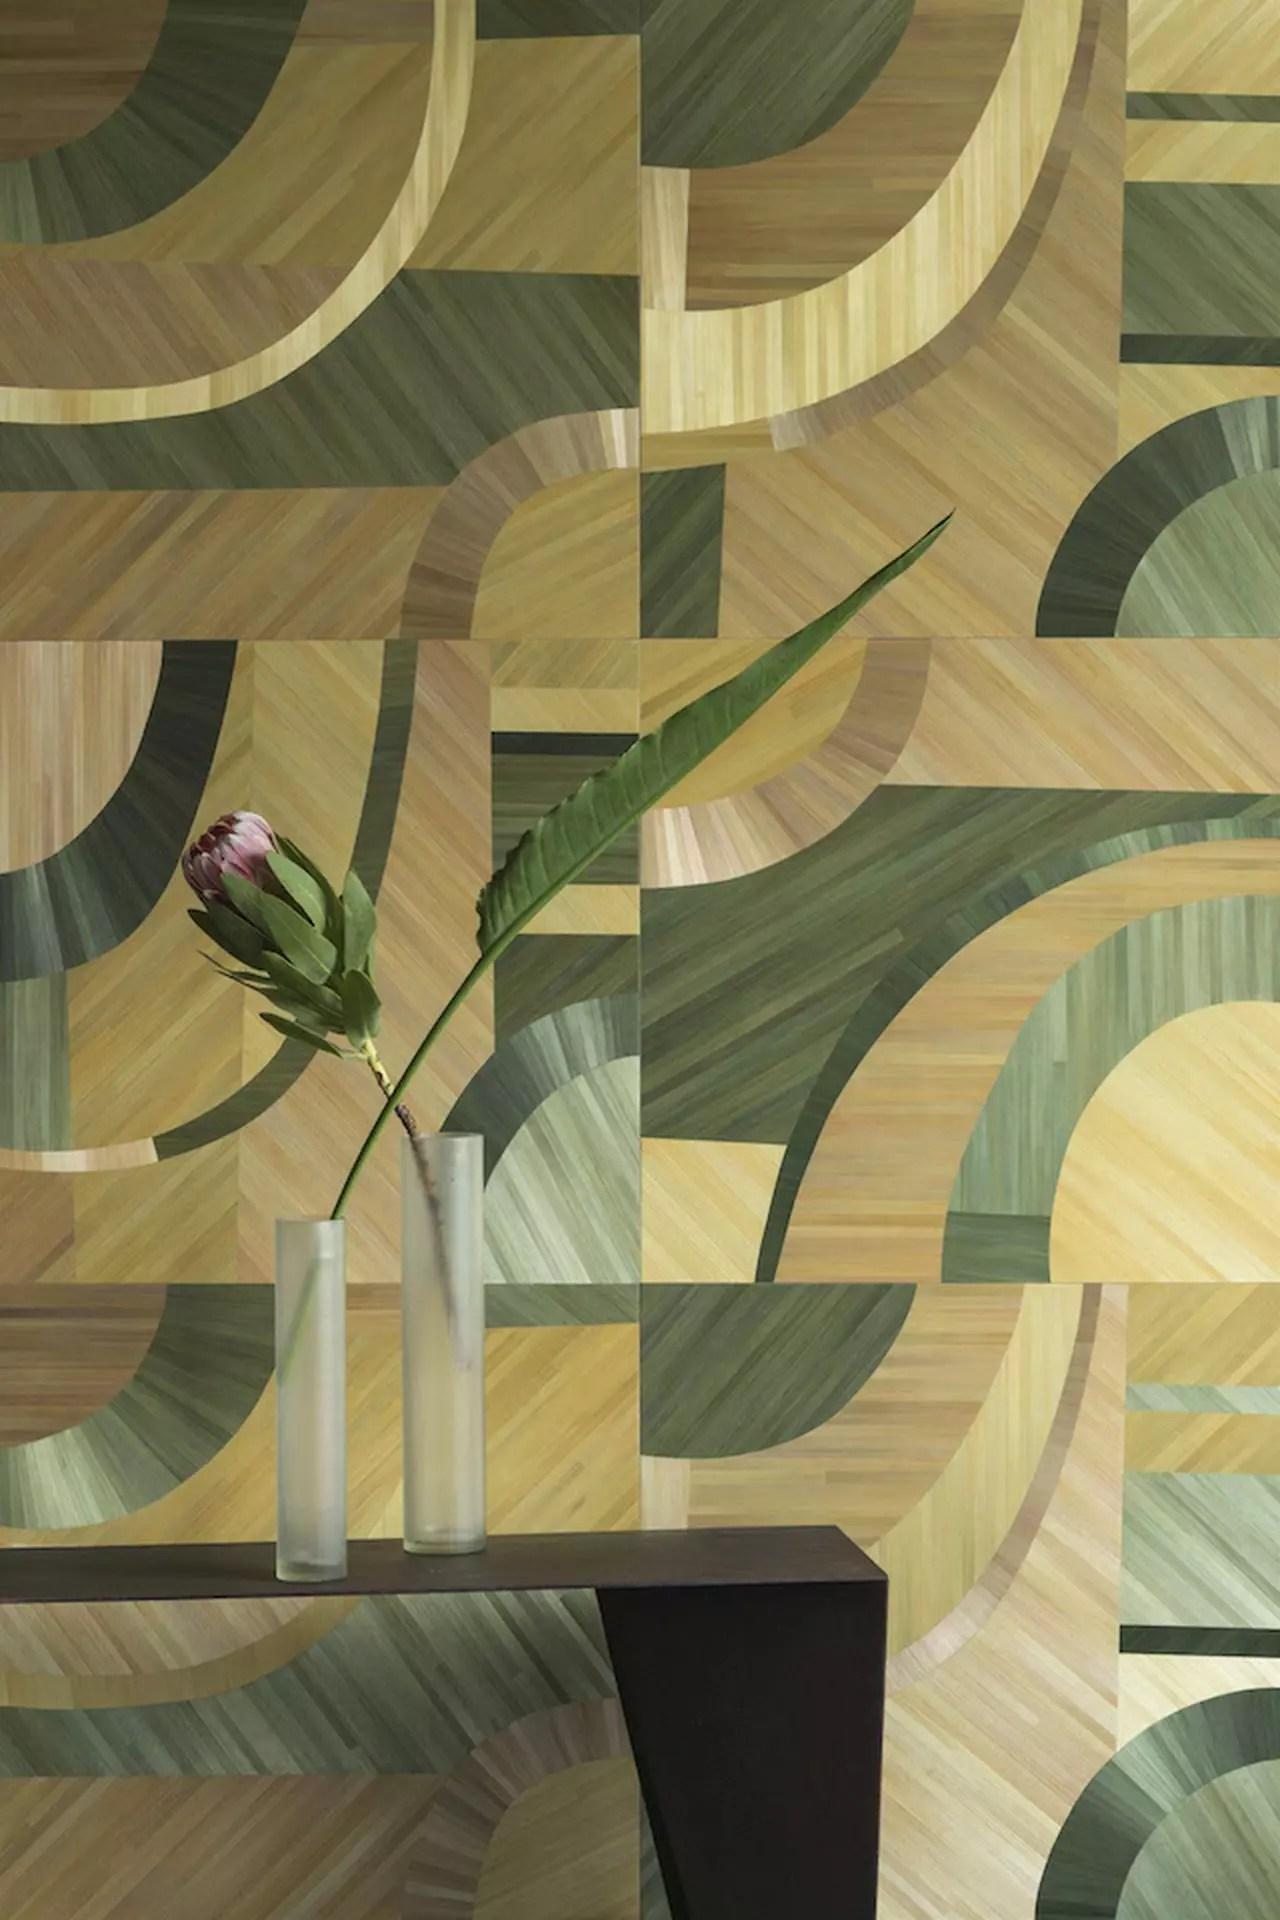 Pannelli decorativi per pareti interne rivestimenti ad hoc